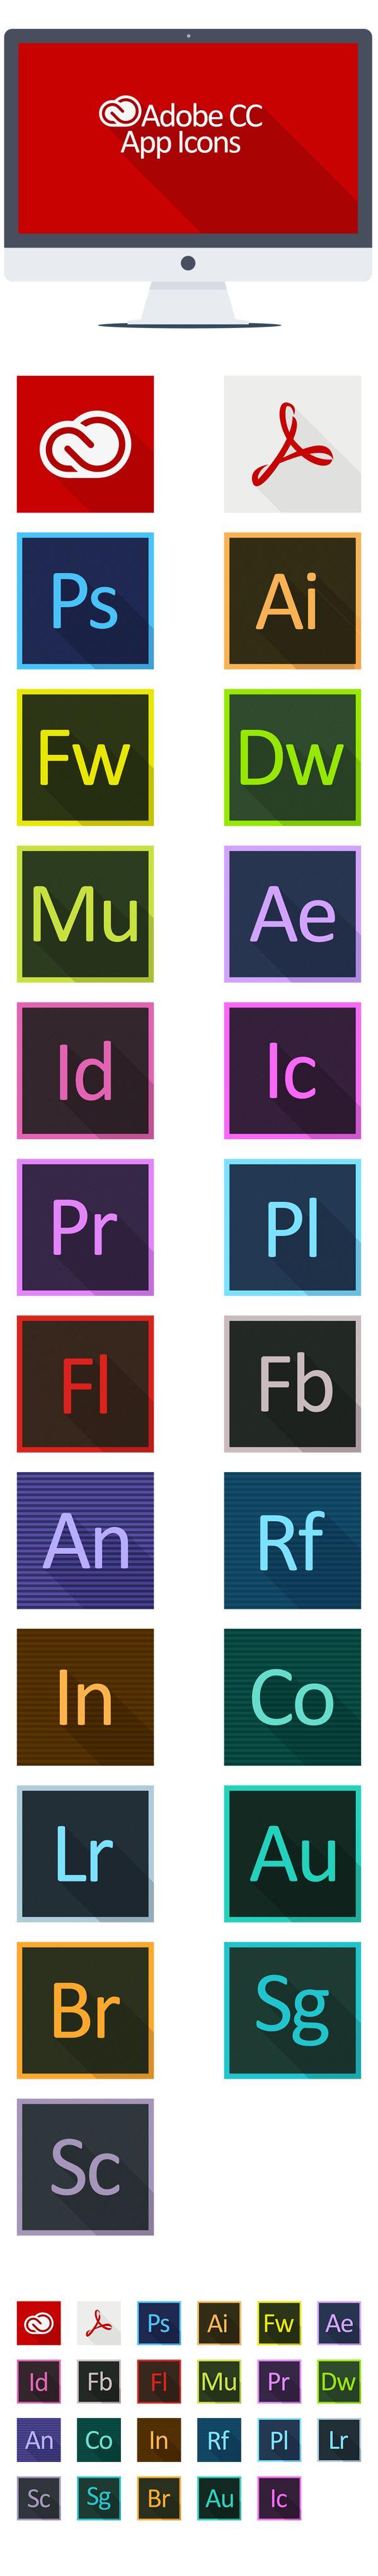 Adobe CC Long Shadow App Icons by KPL Designs , via Behance